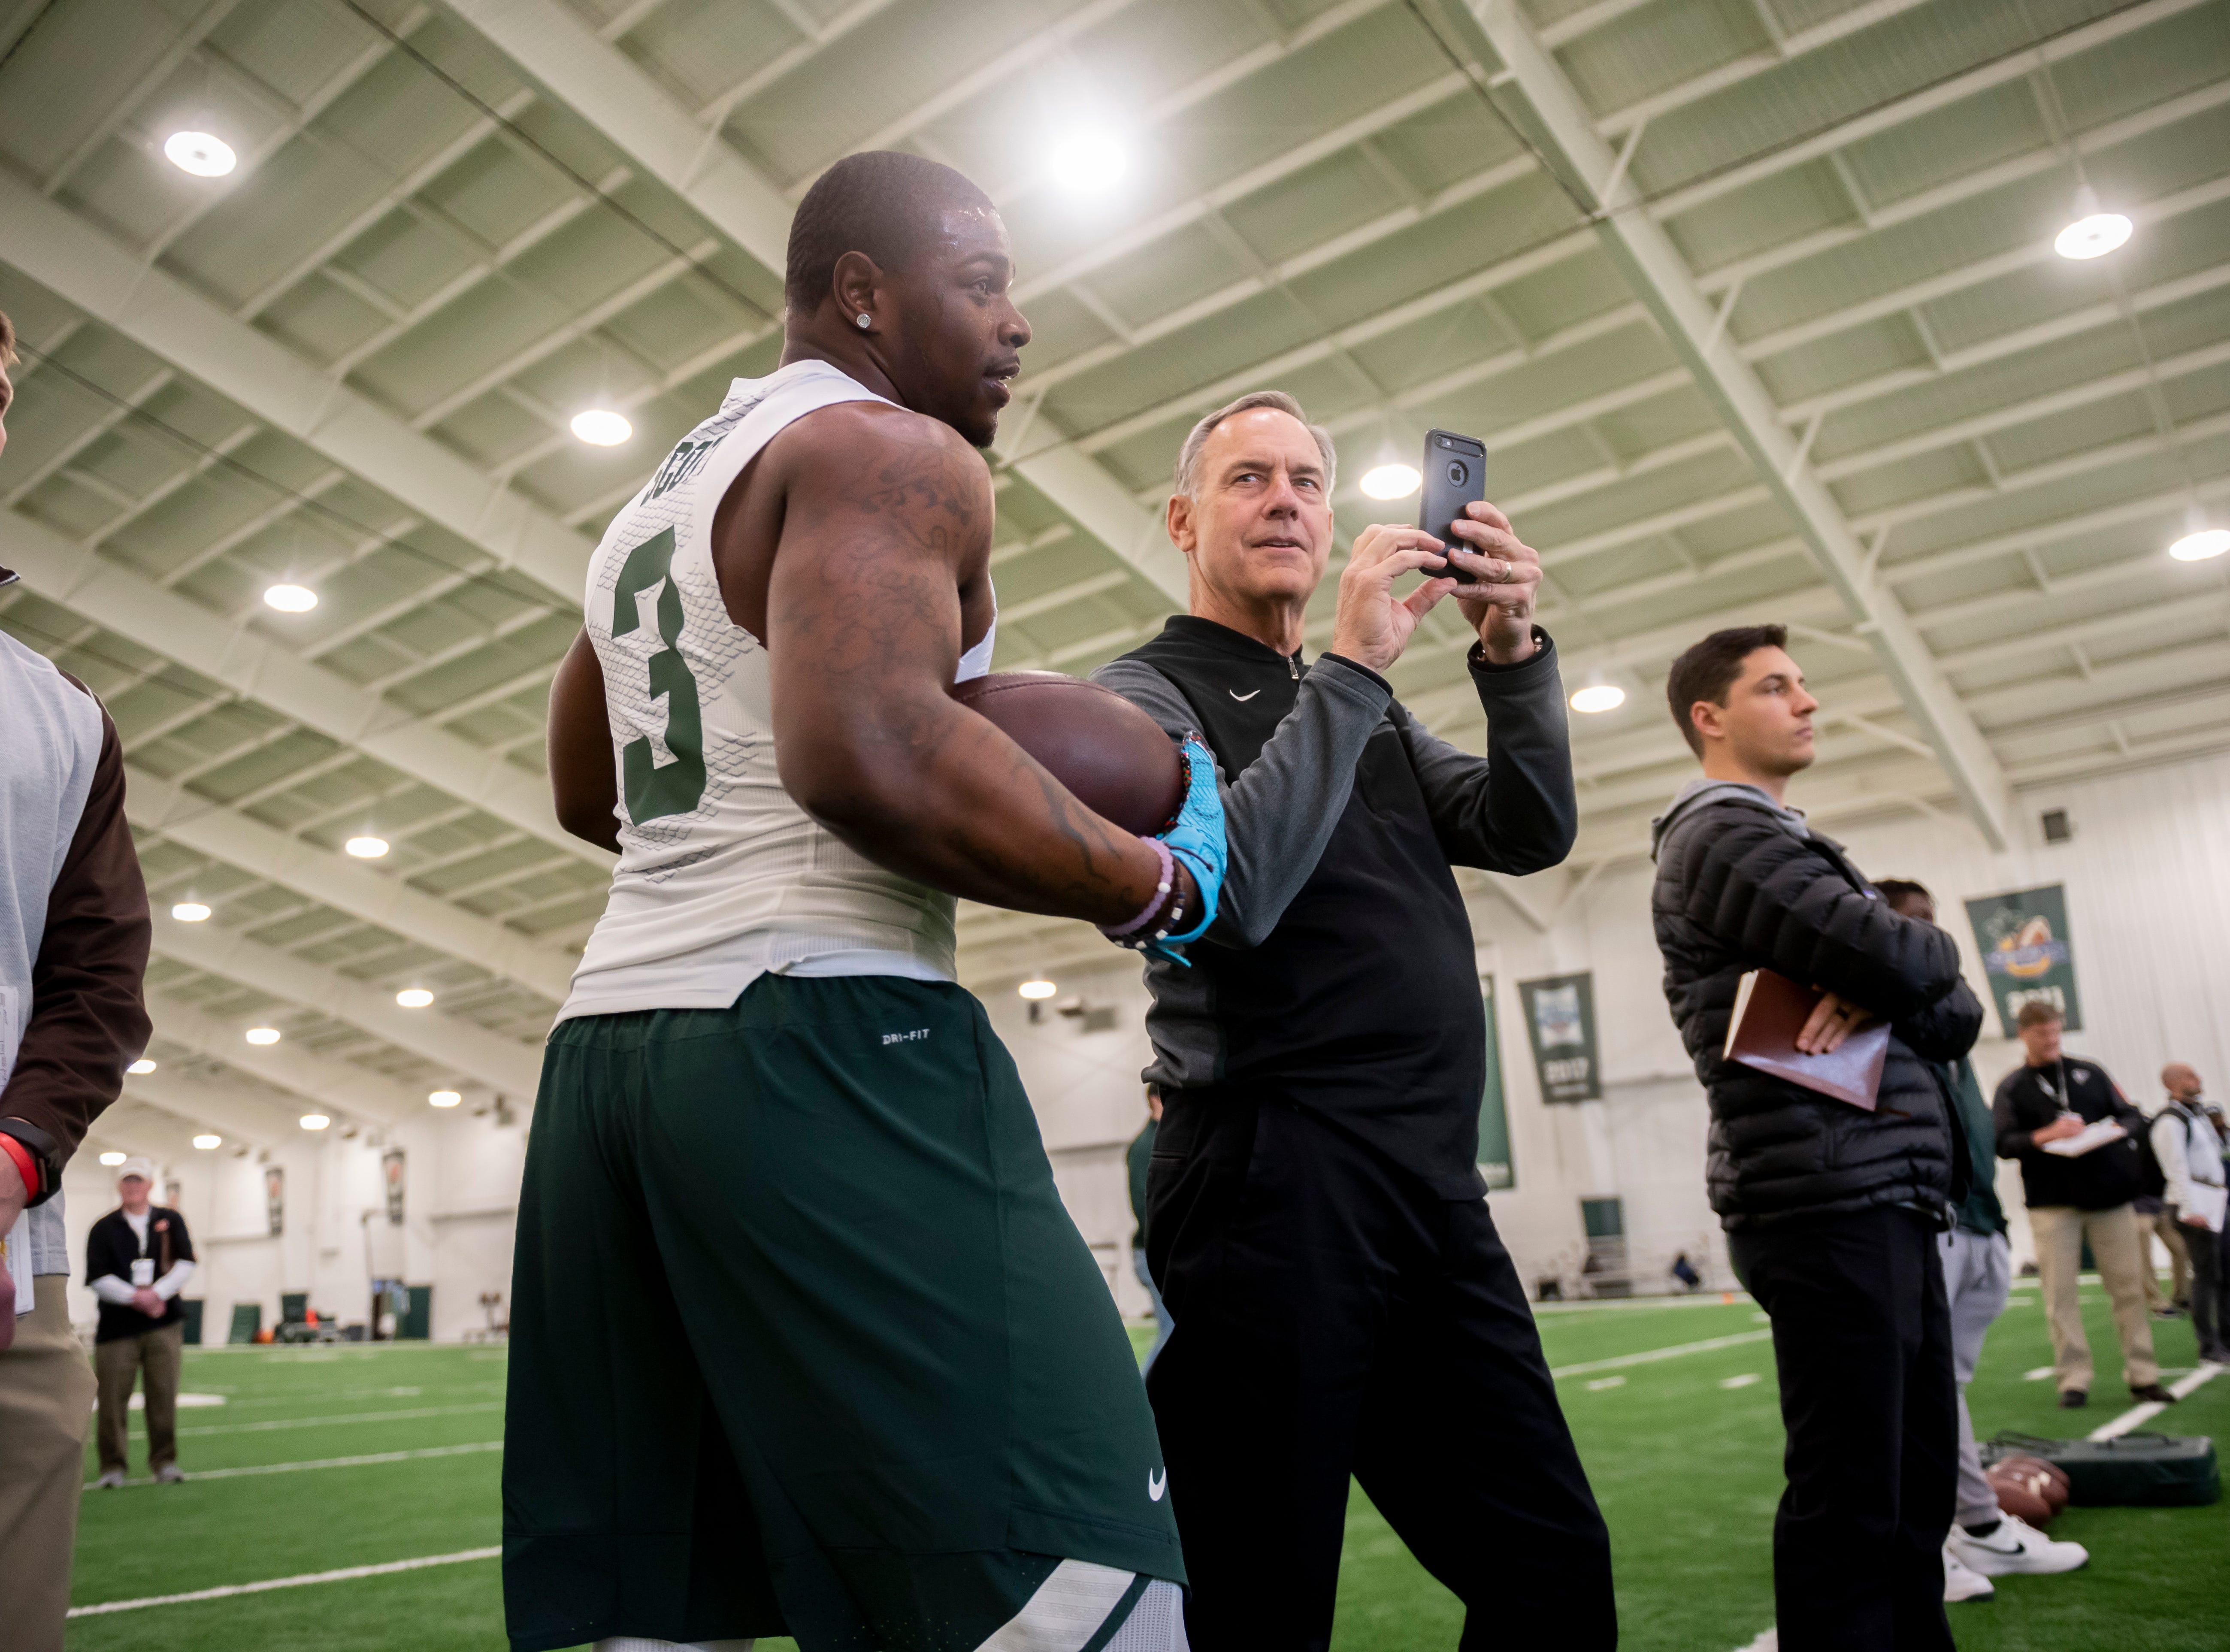 Michigan State head coach Mark Dantonio smirks at running back LJ Scott after Scott almost ran into Dantonio while running drills.